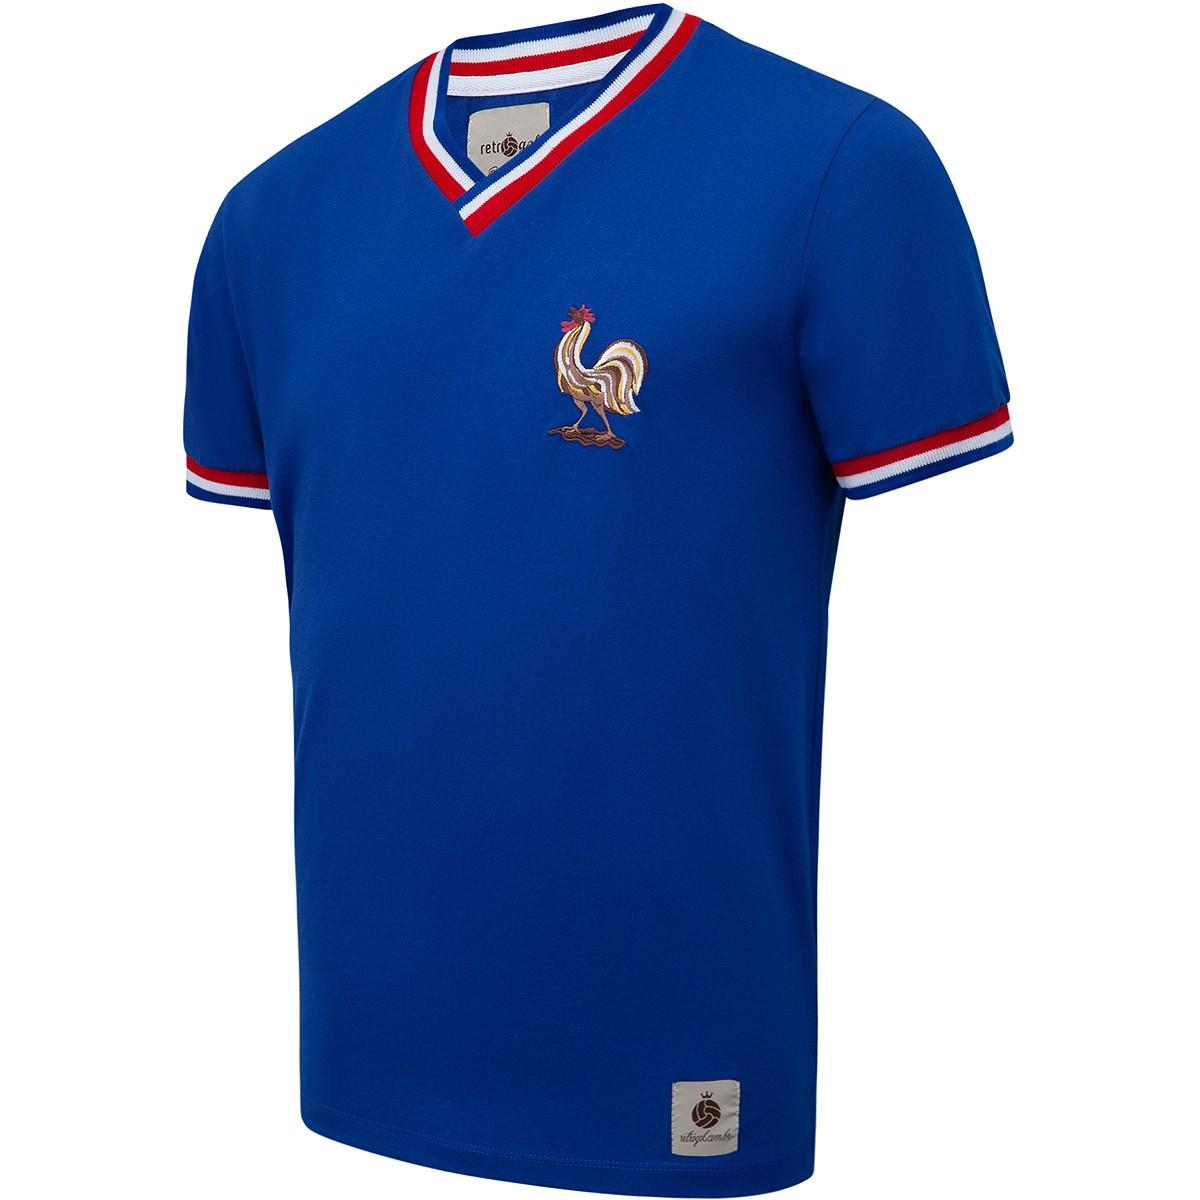 Camisa França Retrô 1966 nº 10 Masculina